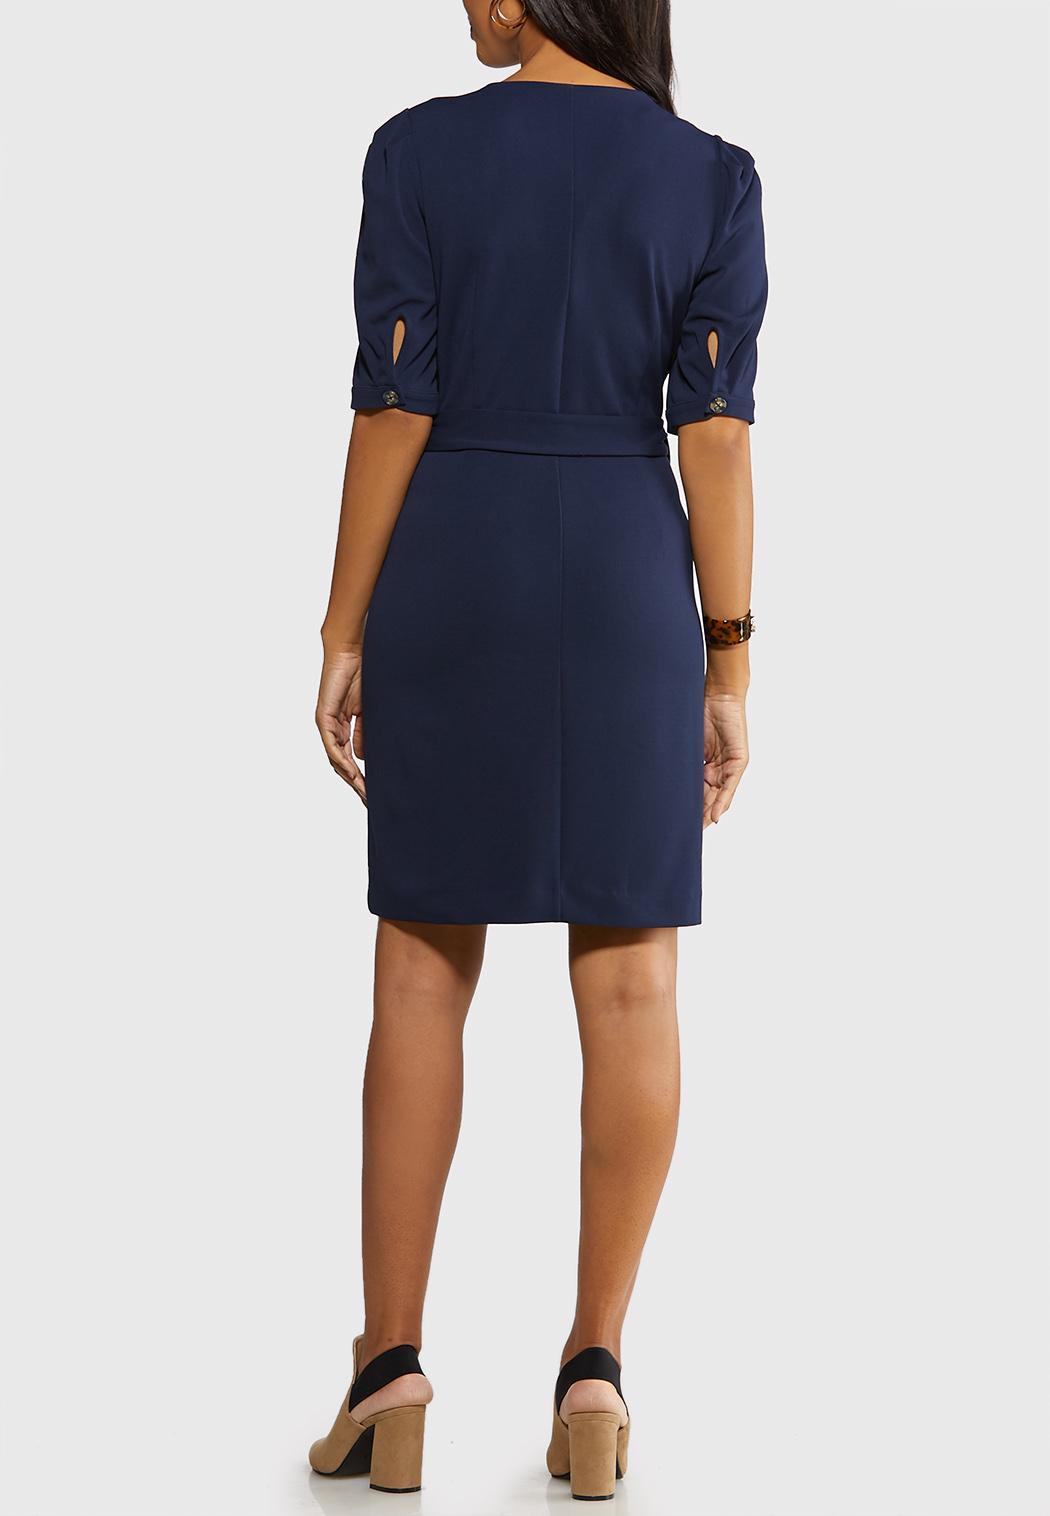 Plus Size Navy Tie Front Dress (Item #44089740)